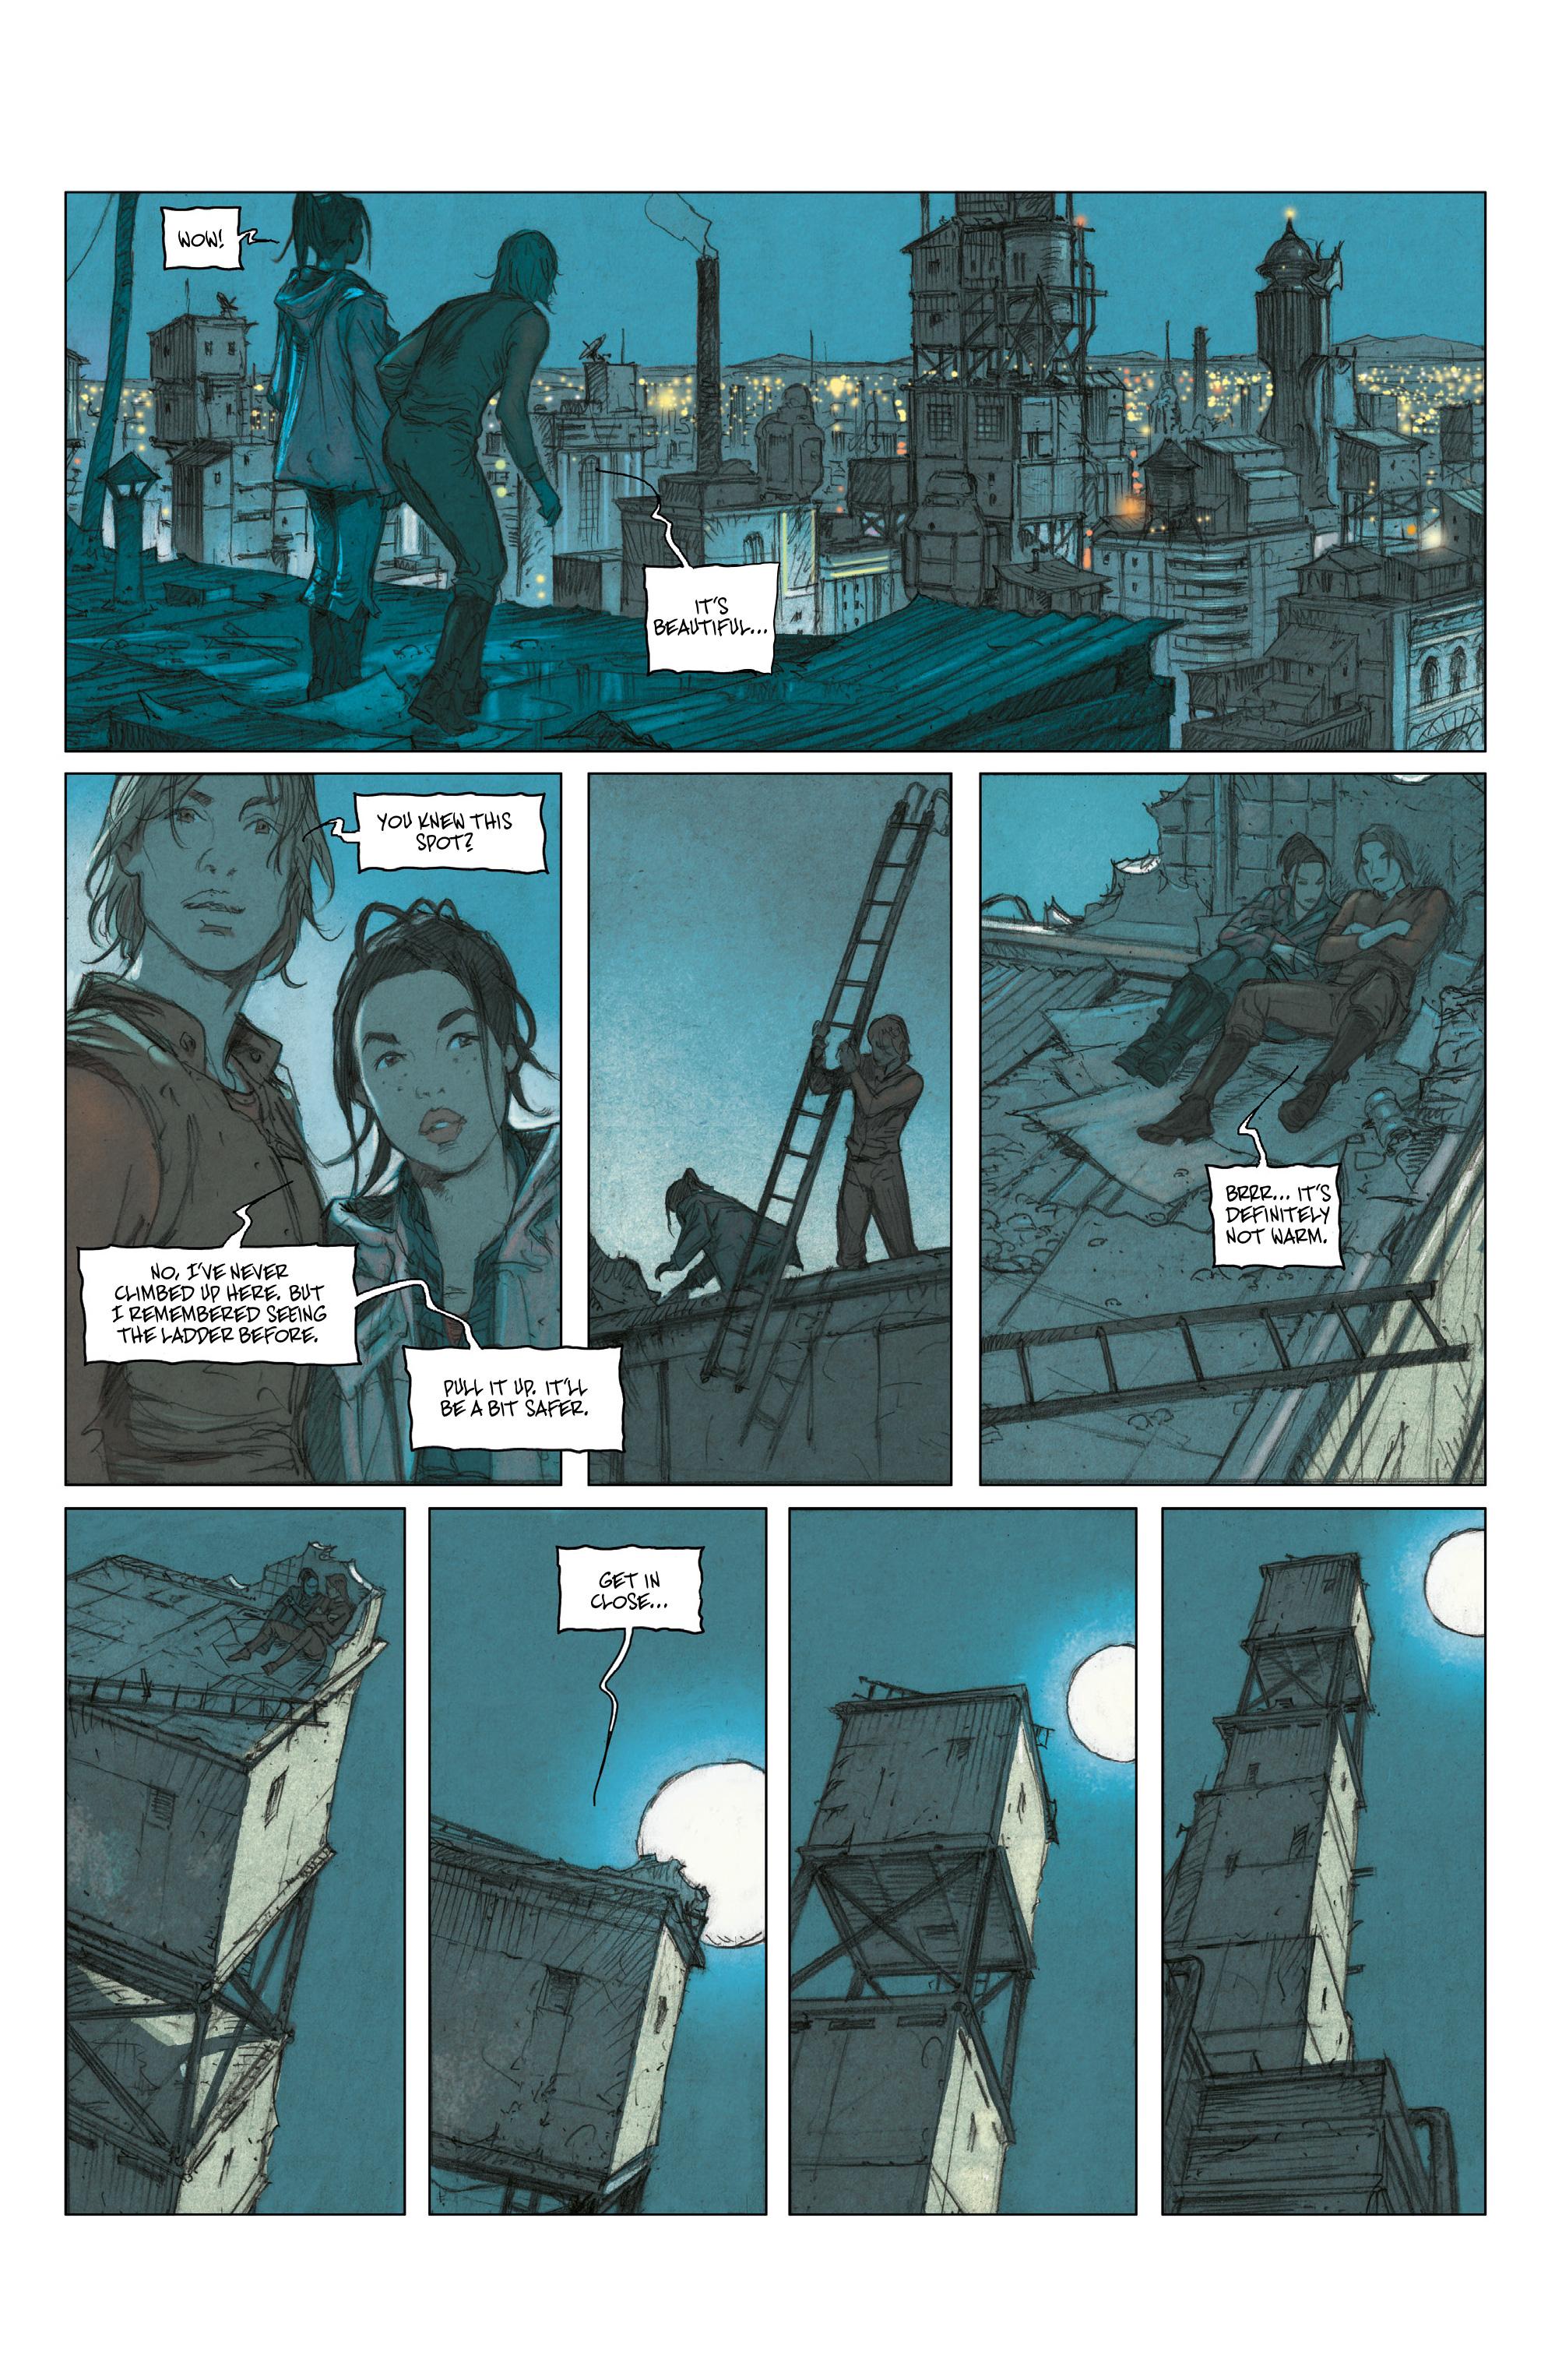 Read online Ab Irato comic -  Issue #2 - 13